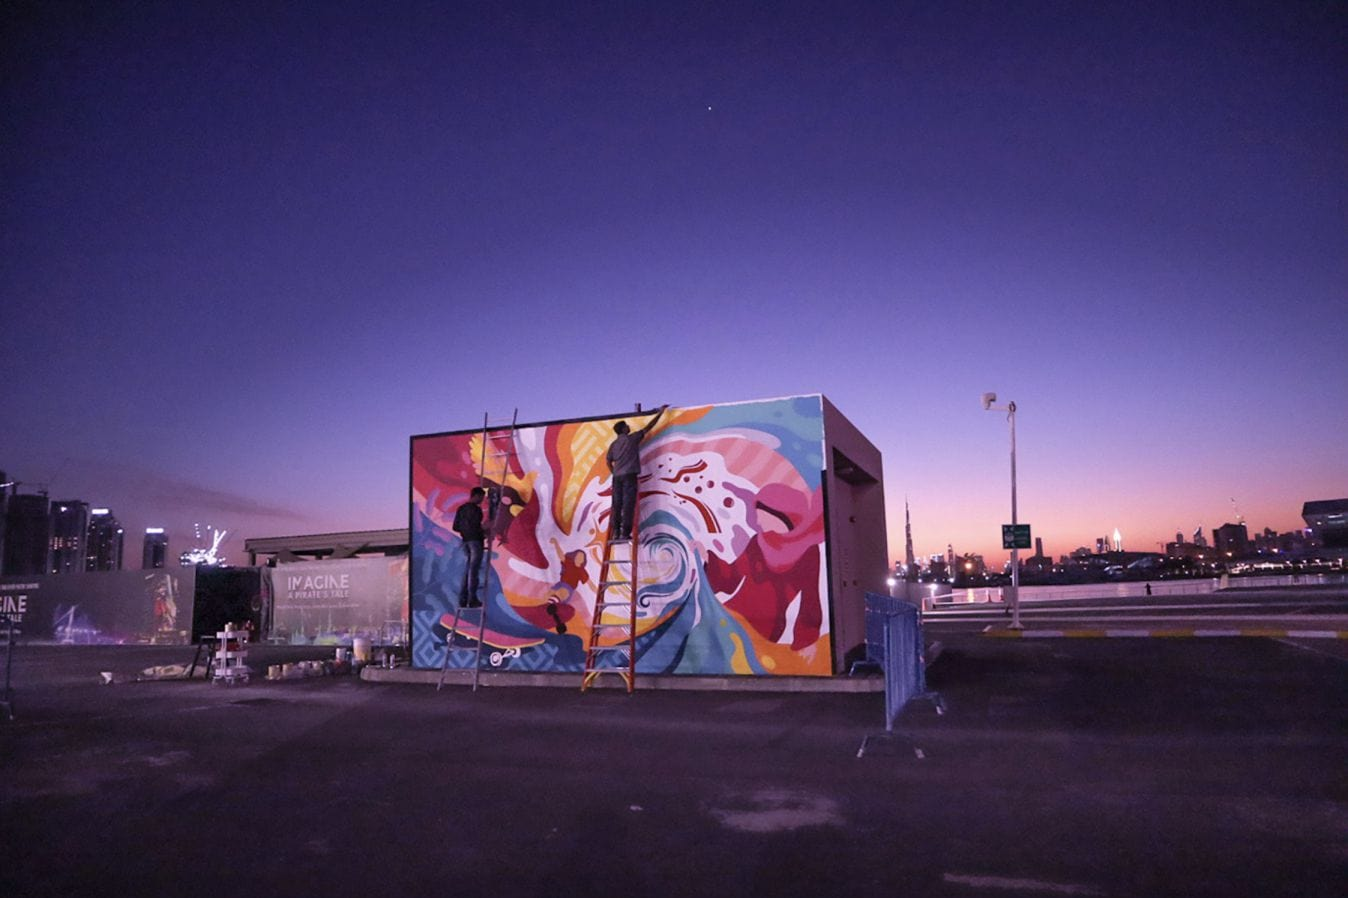 Shahul Hameed - mural and street artist Graffiti artwork